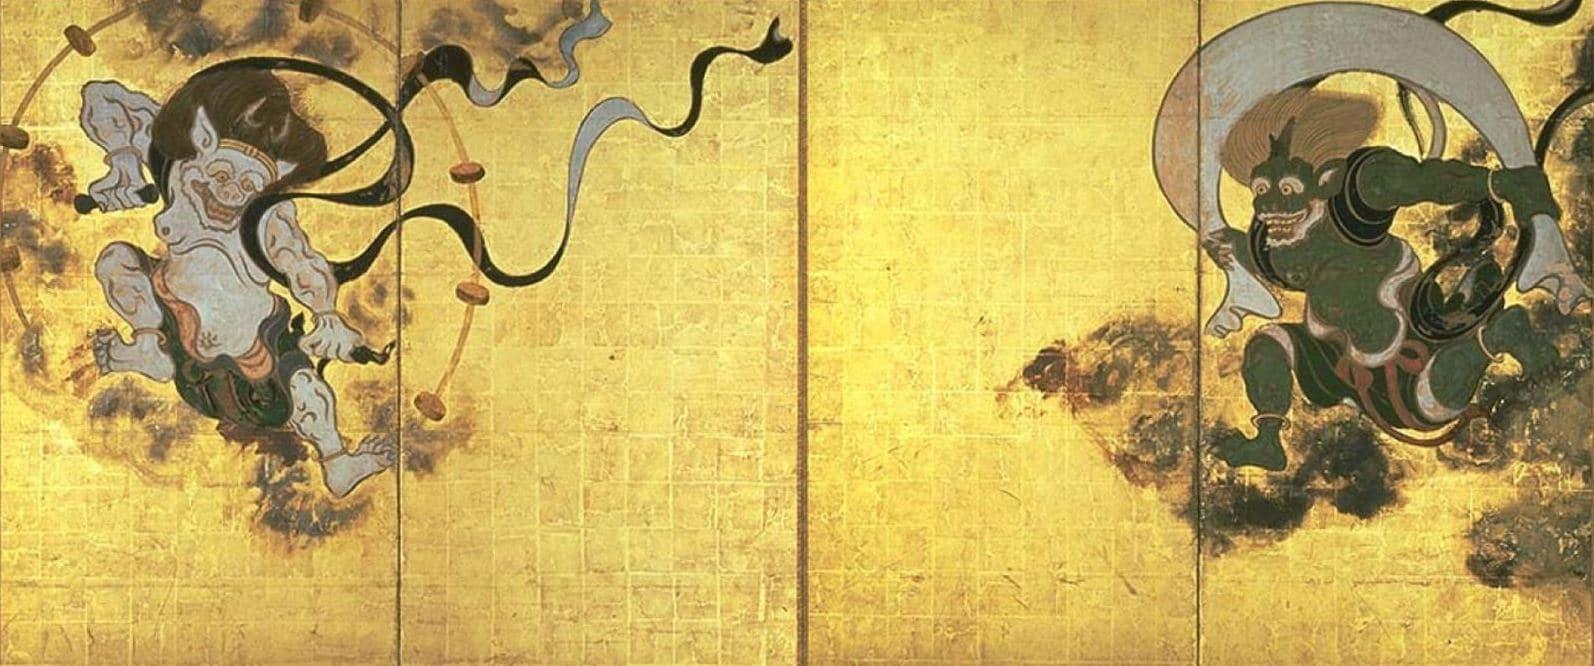 mitologia china